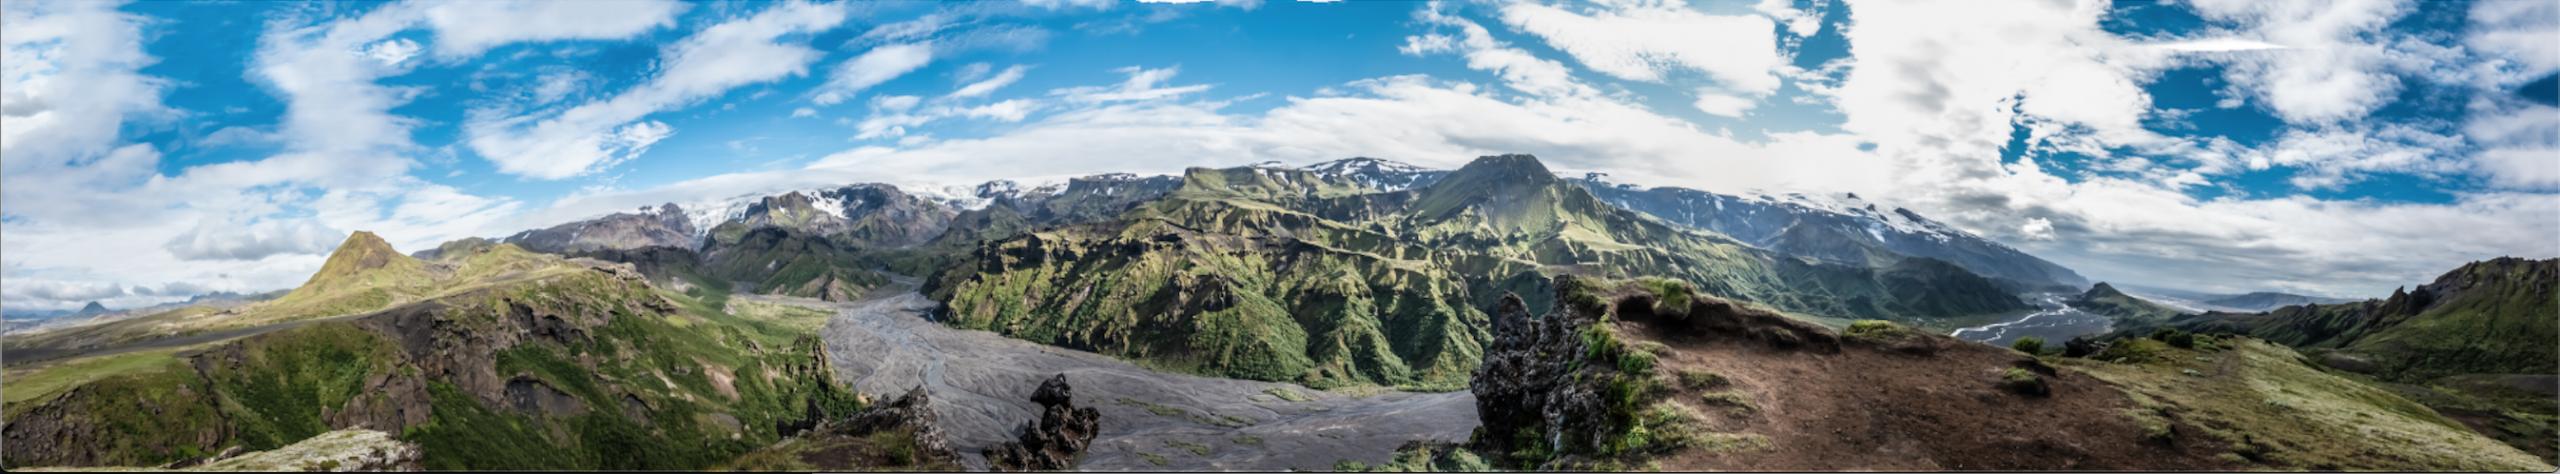 iceland_panorama_mountains_Heather_Tuckman